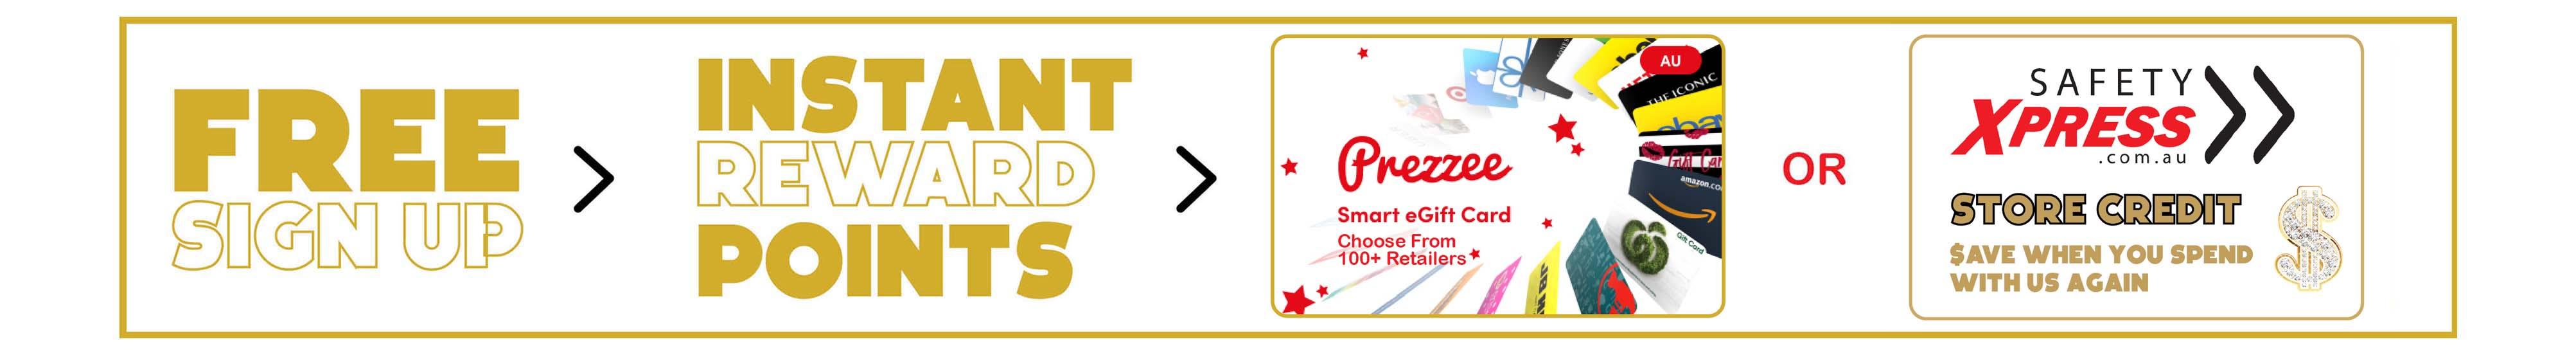 promo-rewards-top-banner-white.jpg